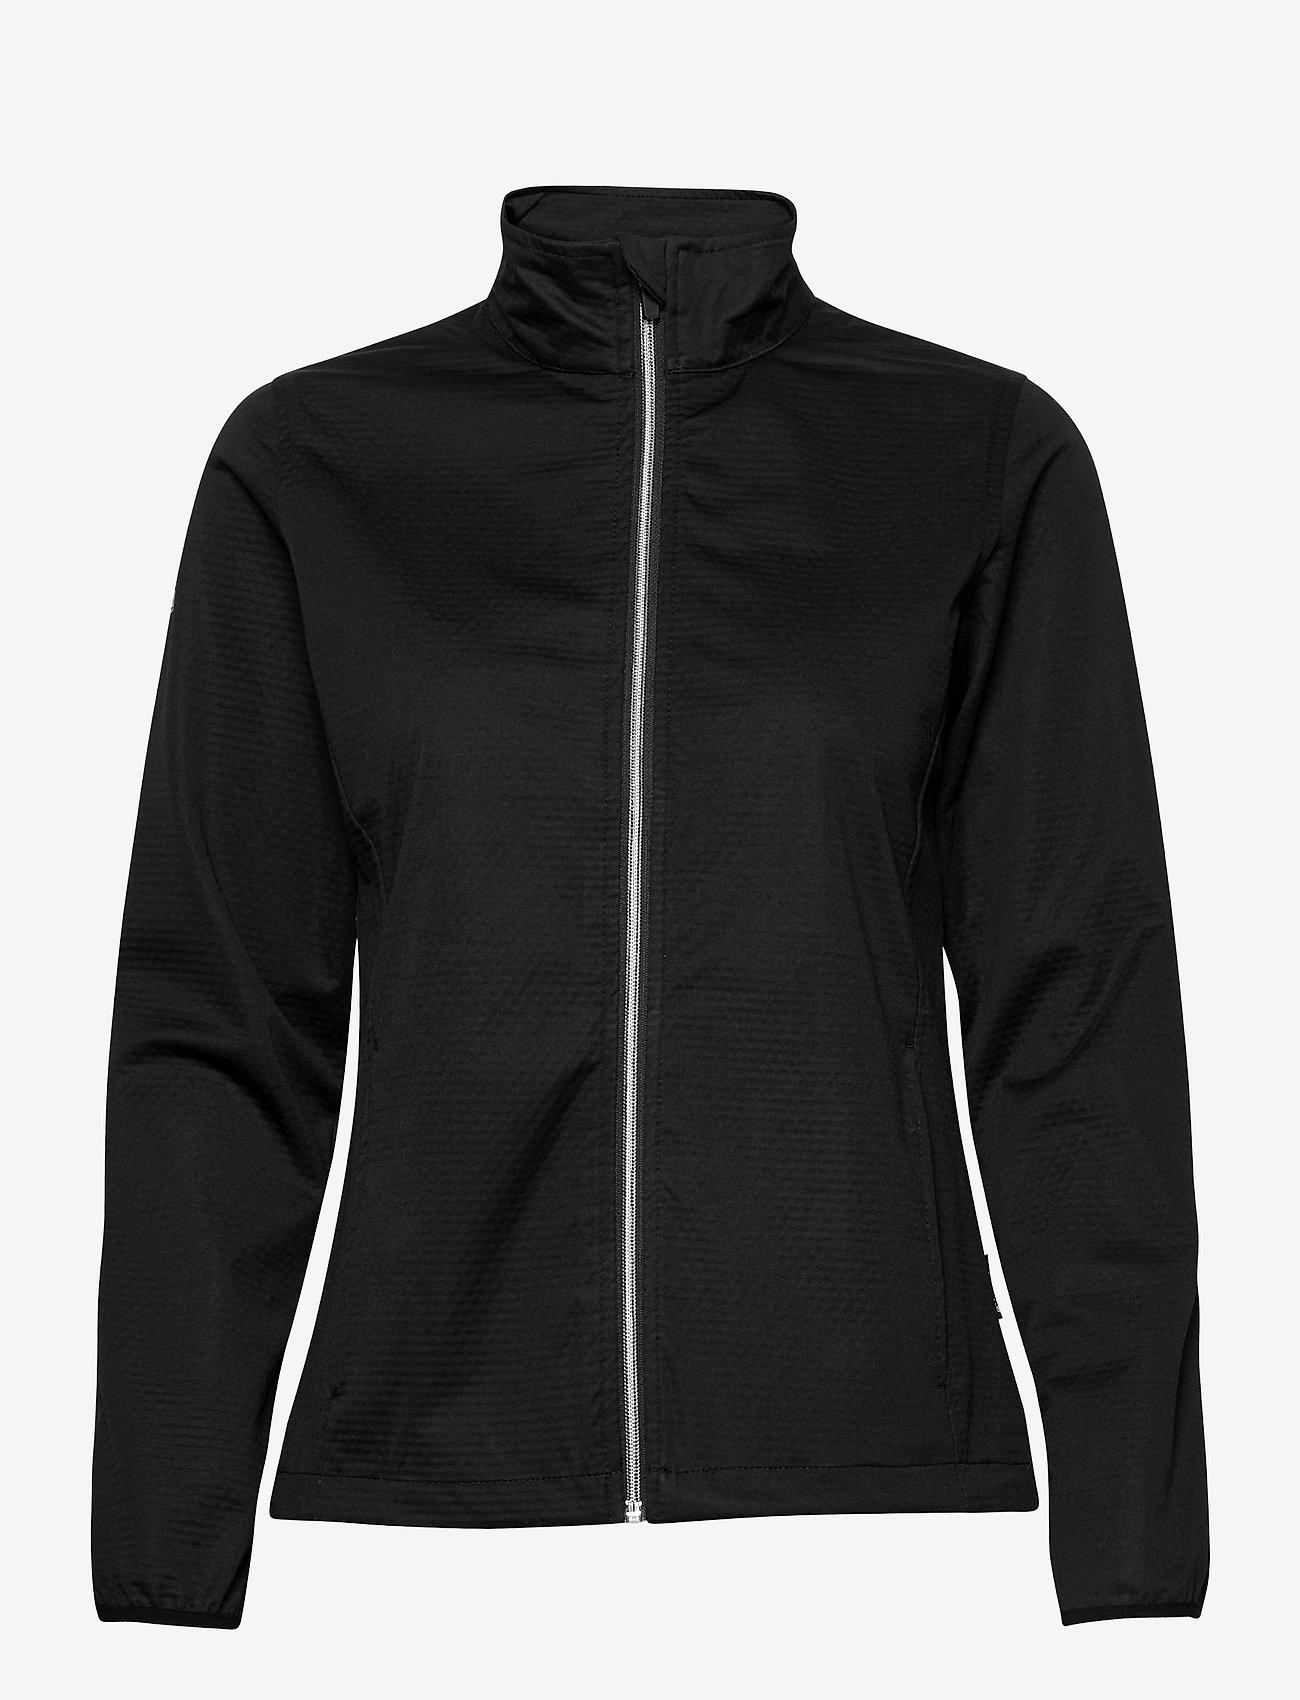 Abacus - Lds Lytham softshell jacket - golf jassen - black - 0